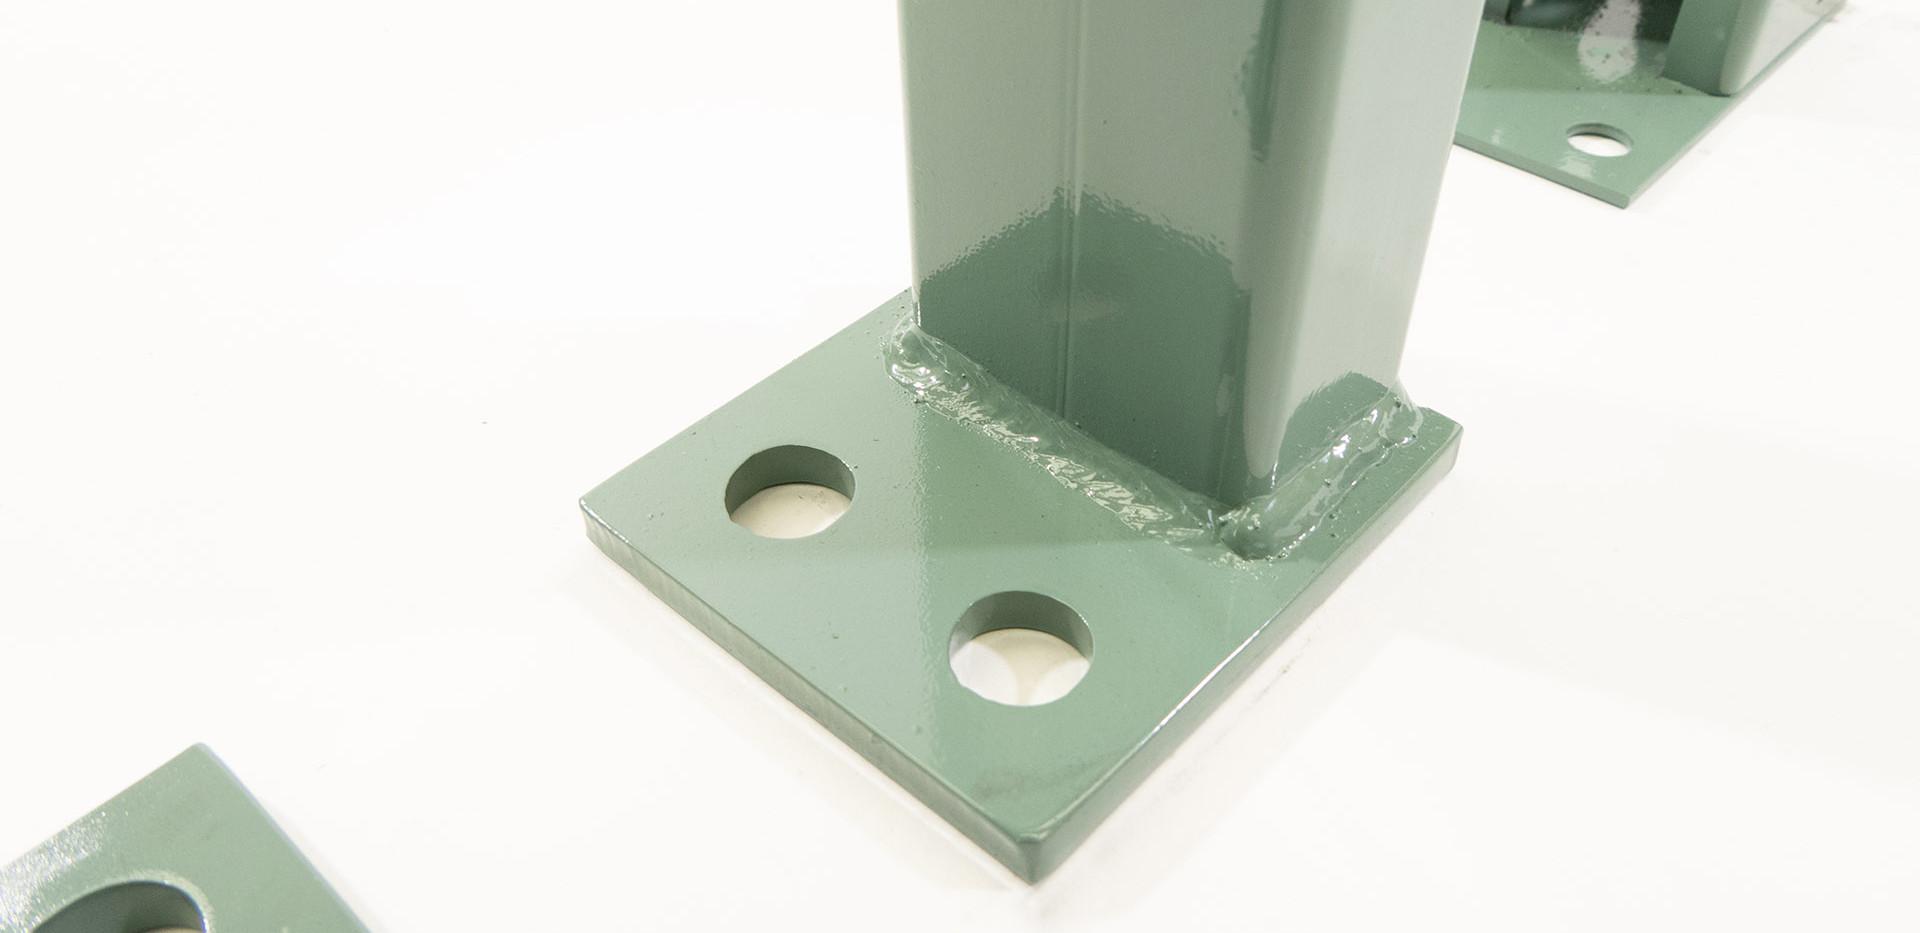 Pallet Rack Upright Repair Kits